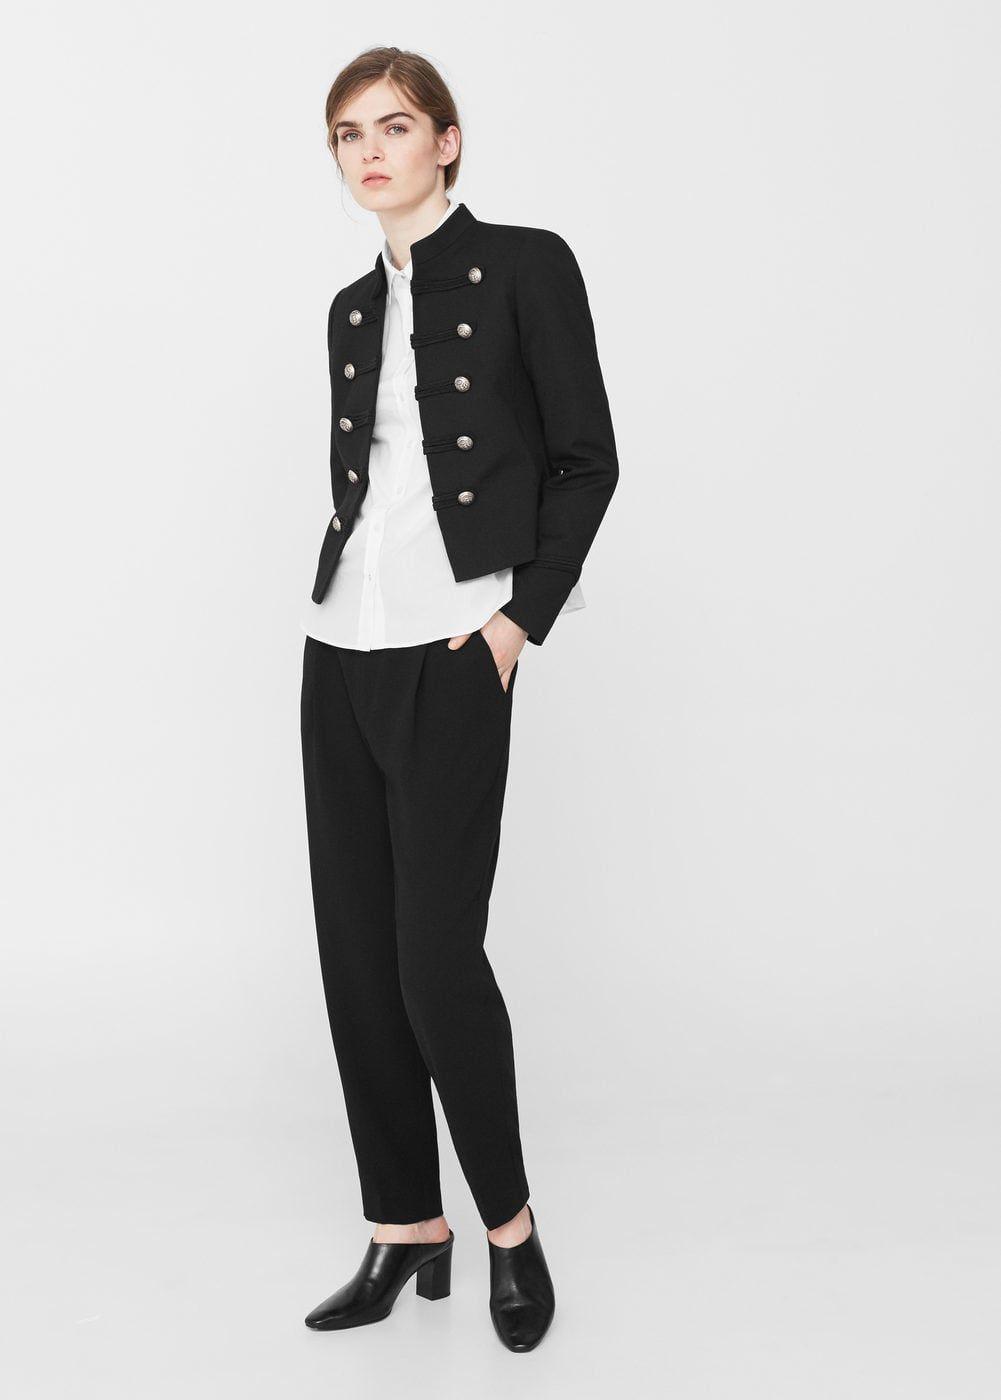 Military Style Jacket Woman Mango Finland Military Style Jackets Military Fashion Sport Chic Style [ 1400 x 1001 Pixel ]